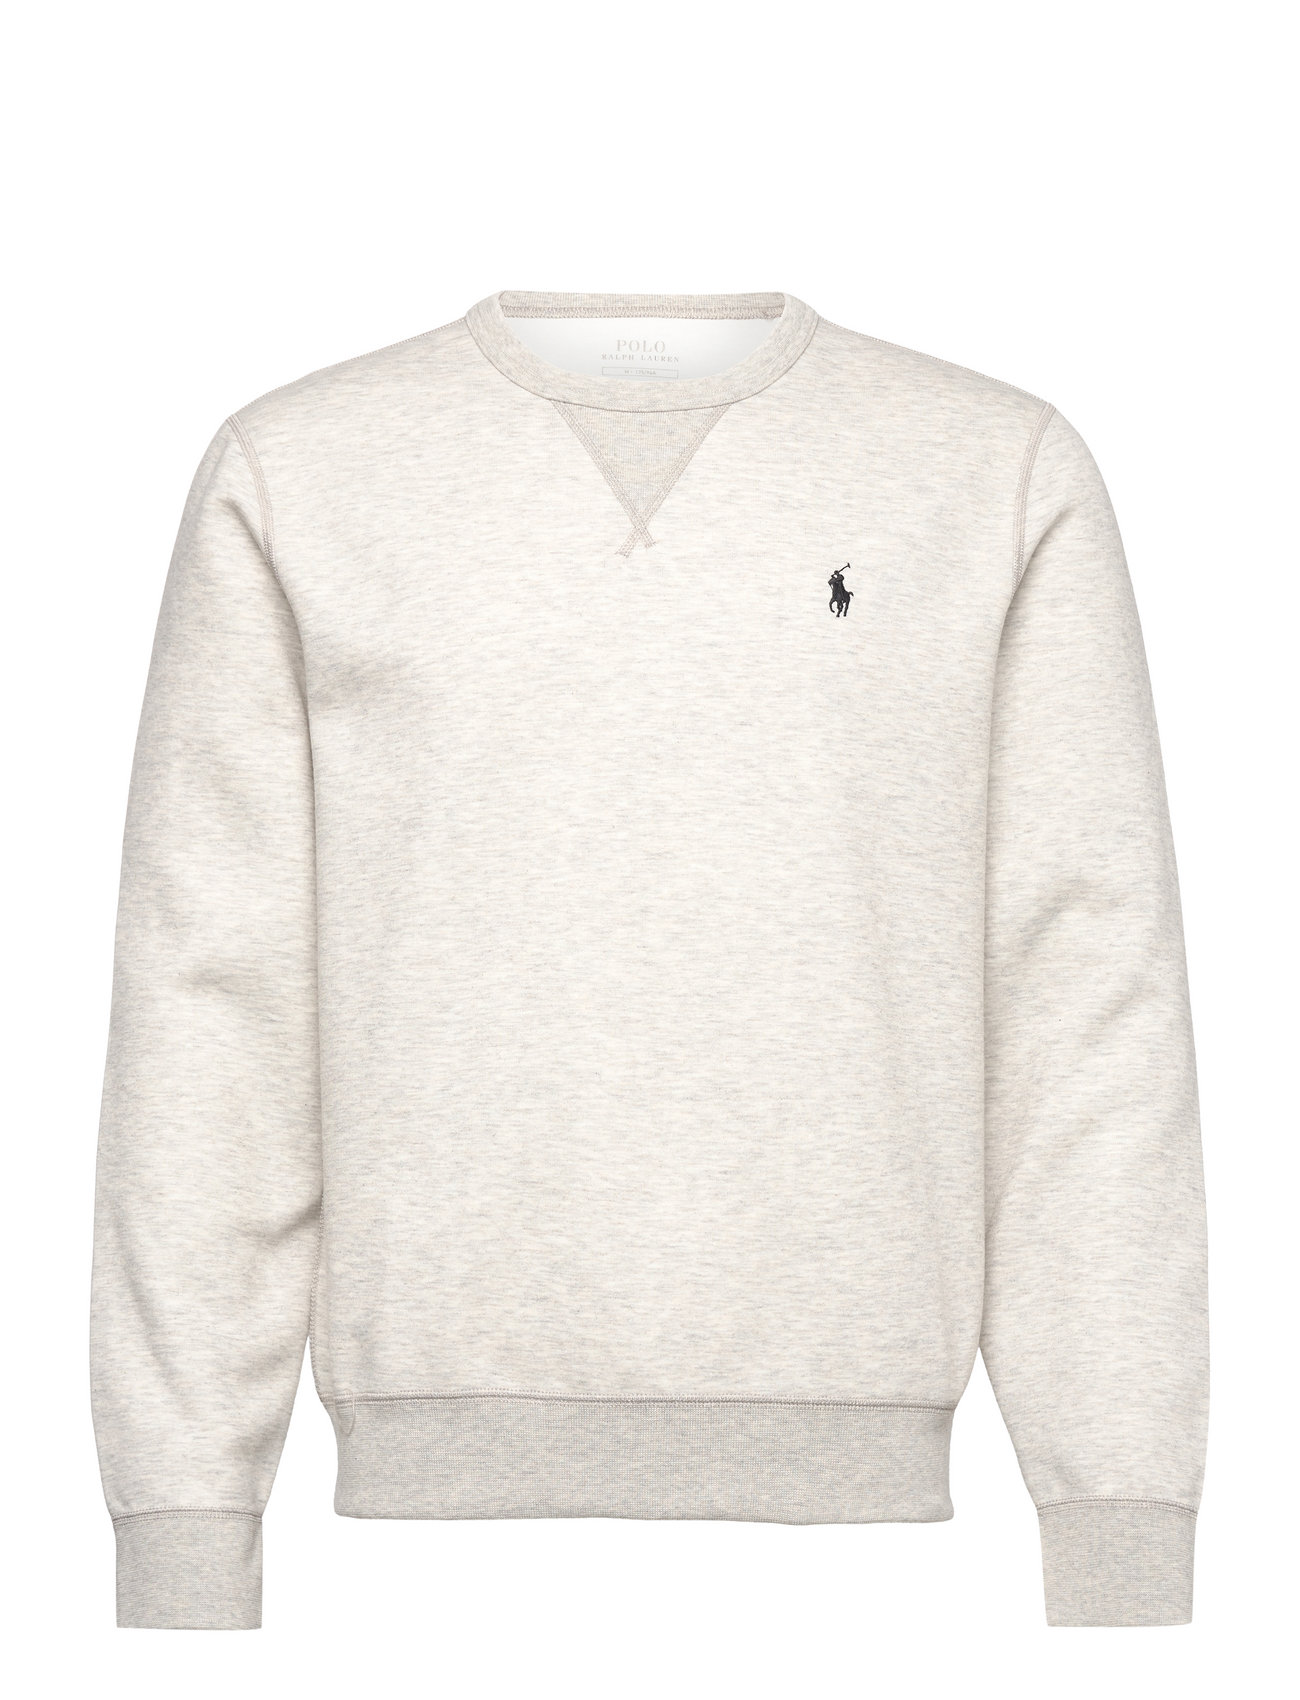 Polo Ralph Lauren Double-Knit Sweatshirt - LT SPORT HEATHER/